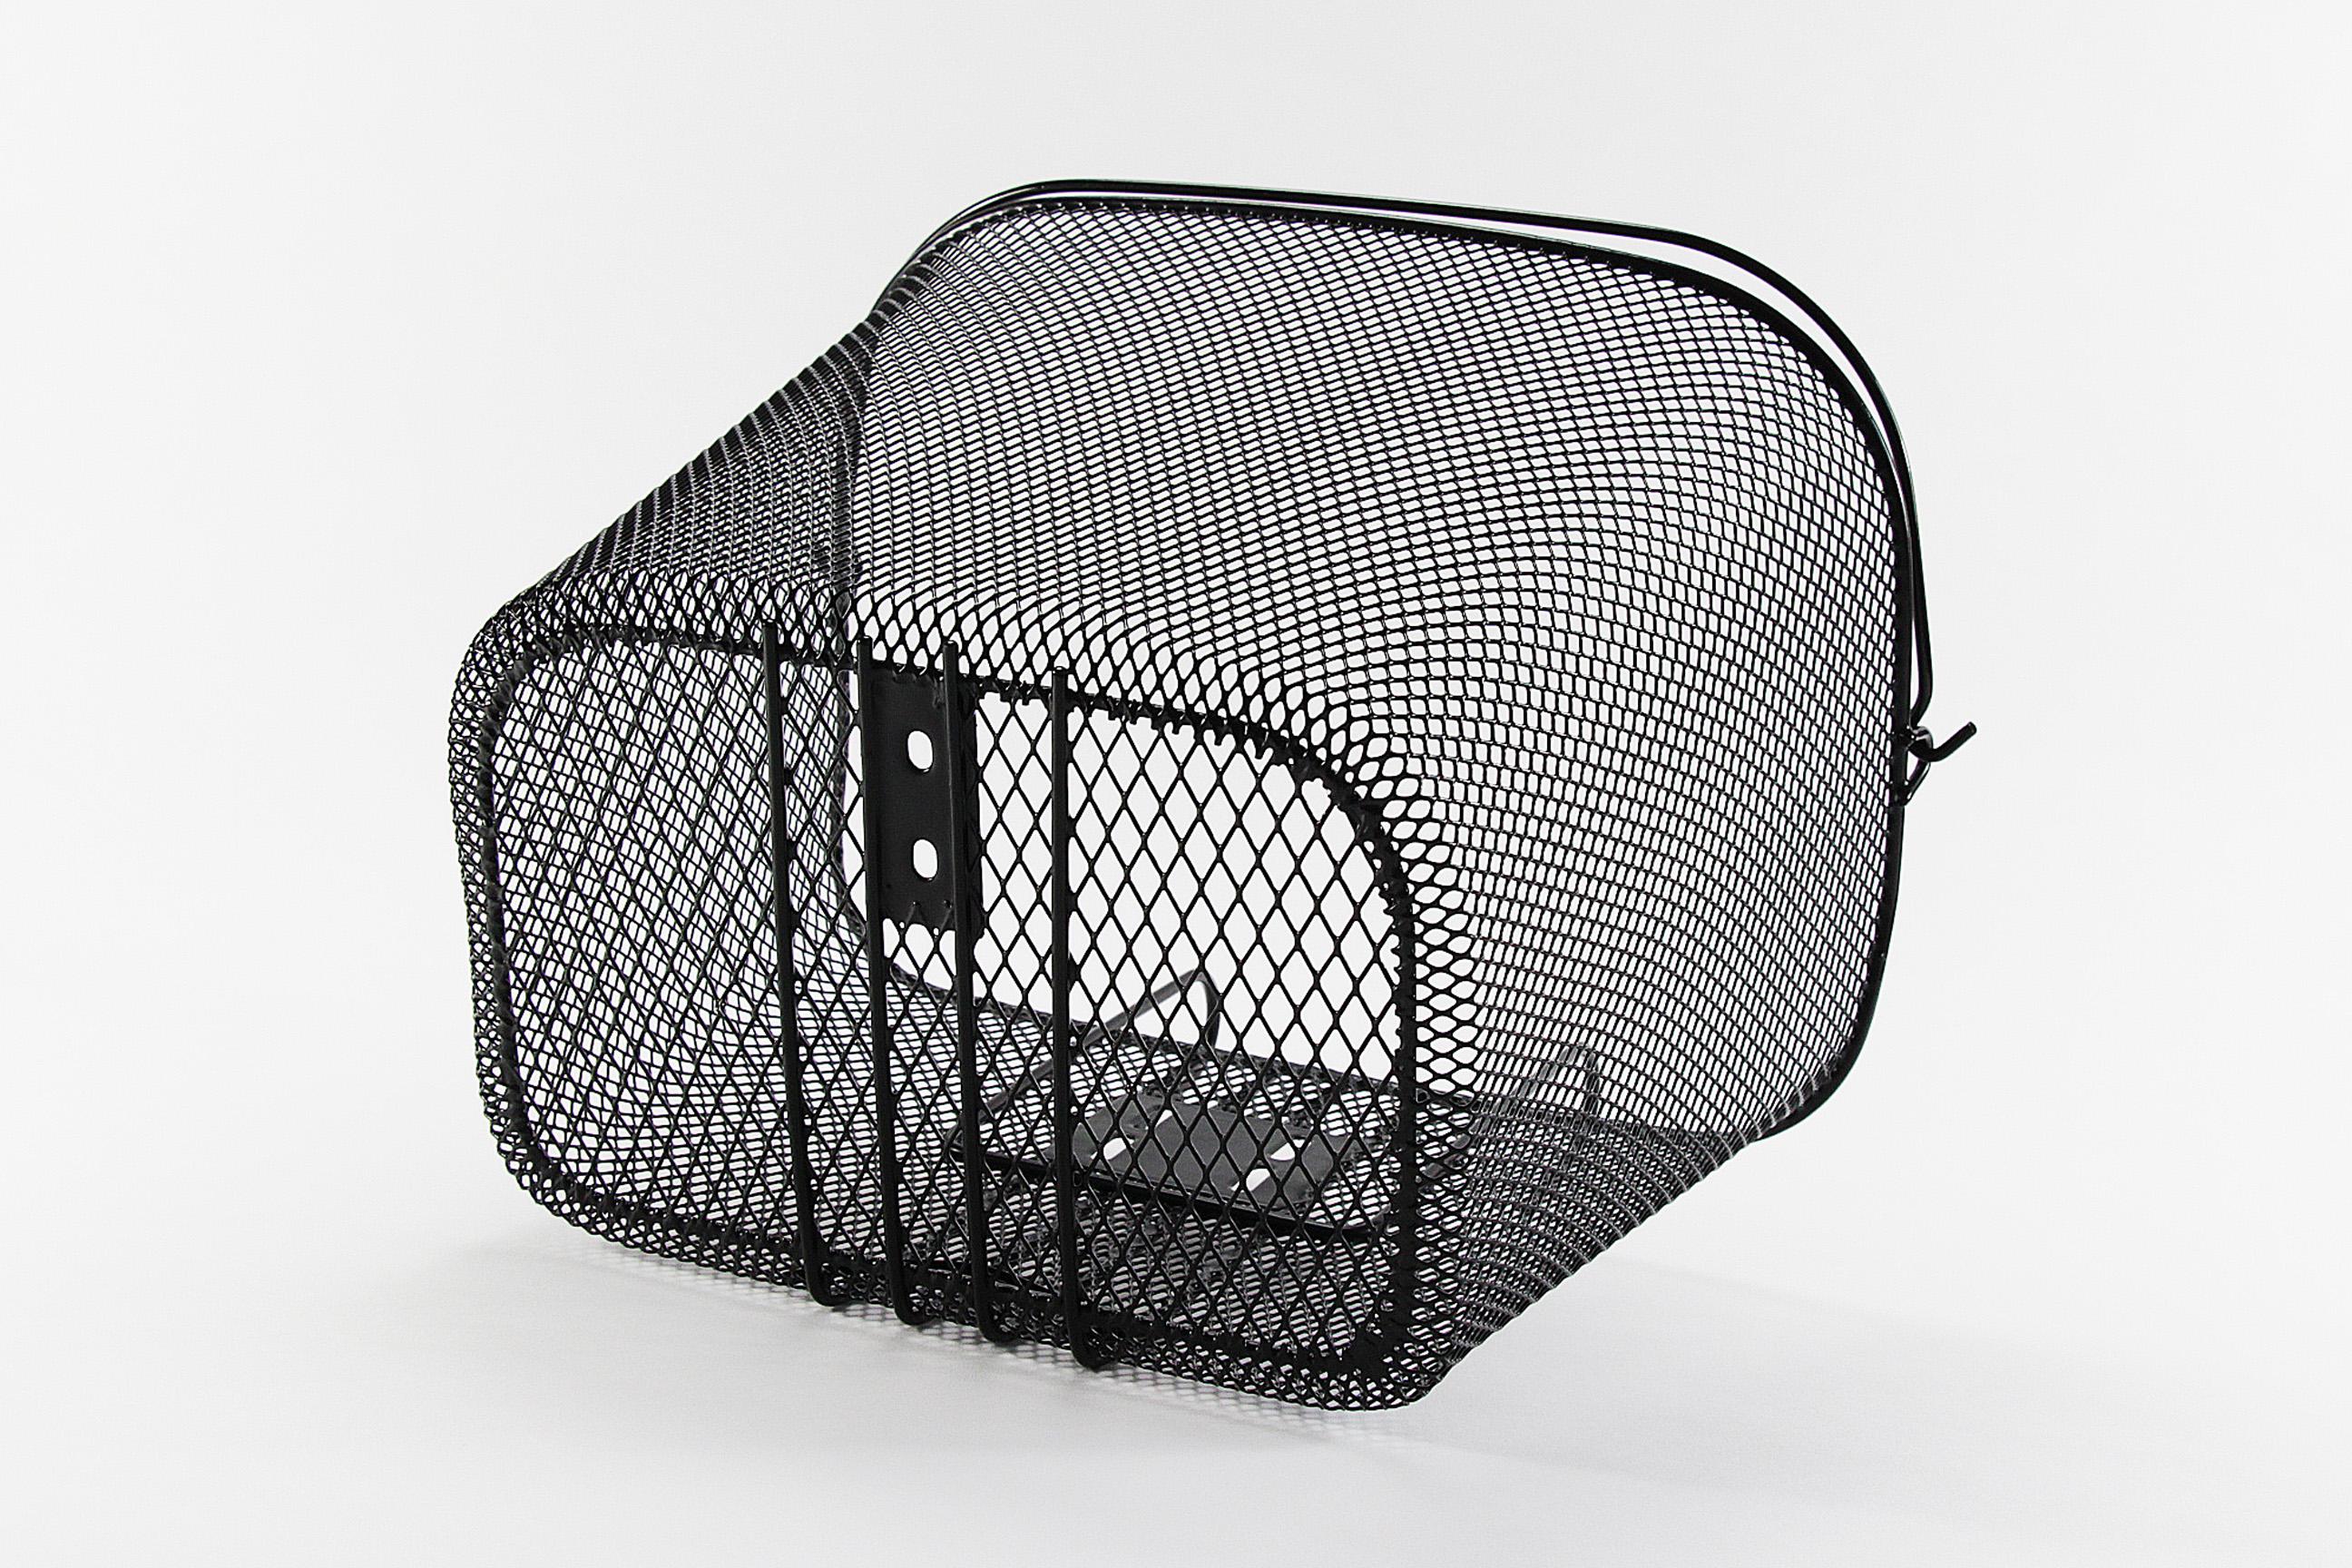 einkaufskorb lenkerkorb wau fahrradkorb tragekorb korb. Black Bedroom Furniture Sets. Home Design Ideas